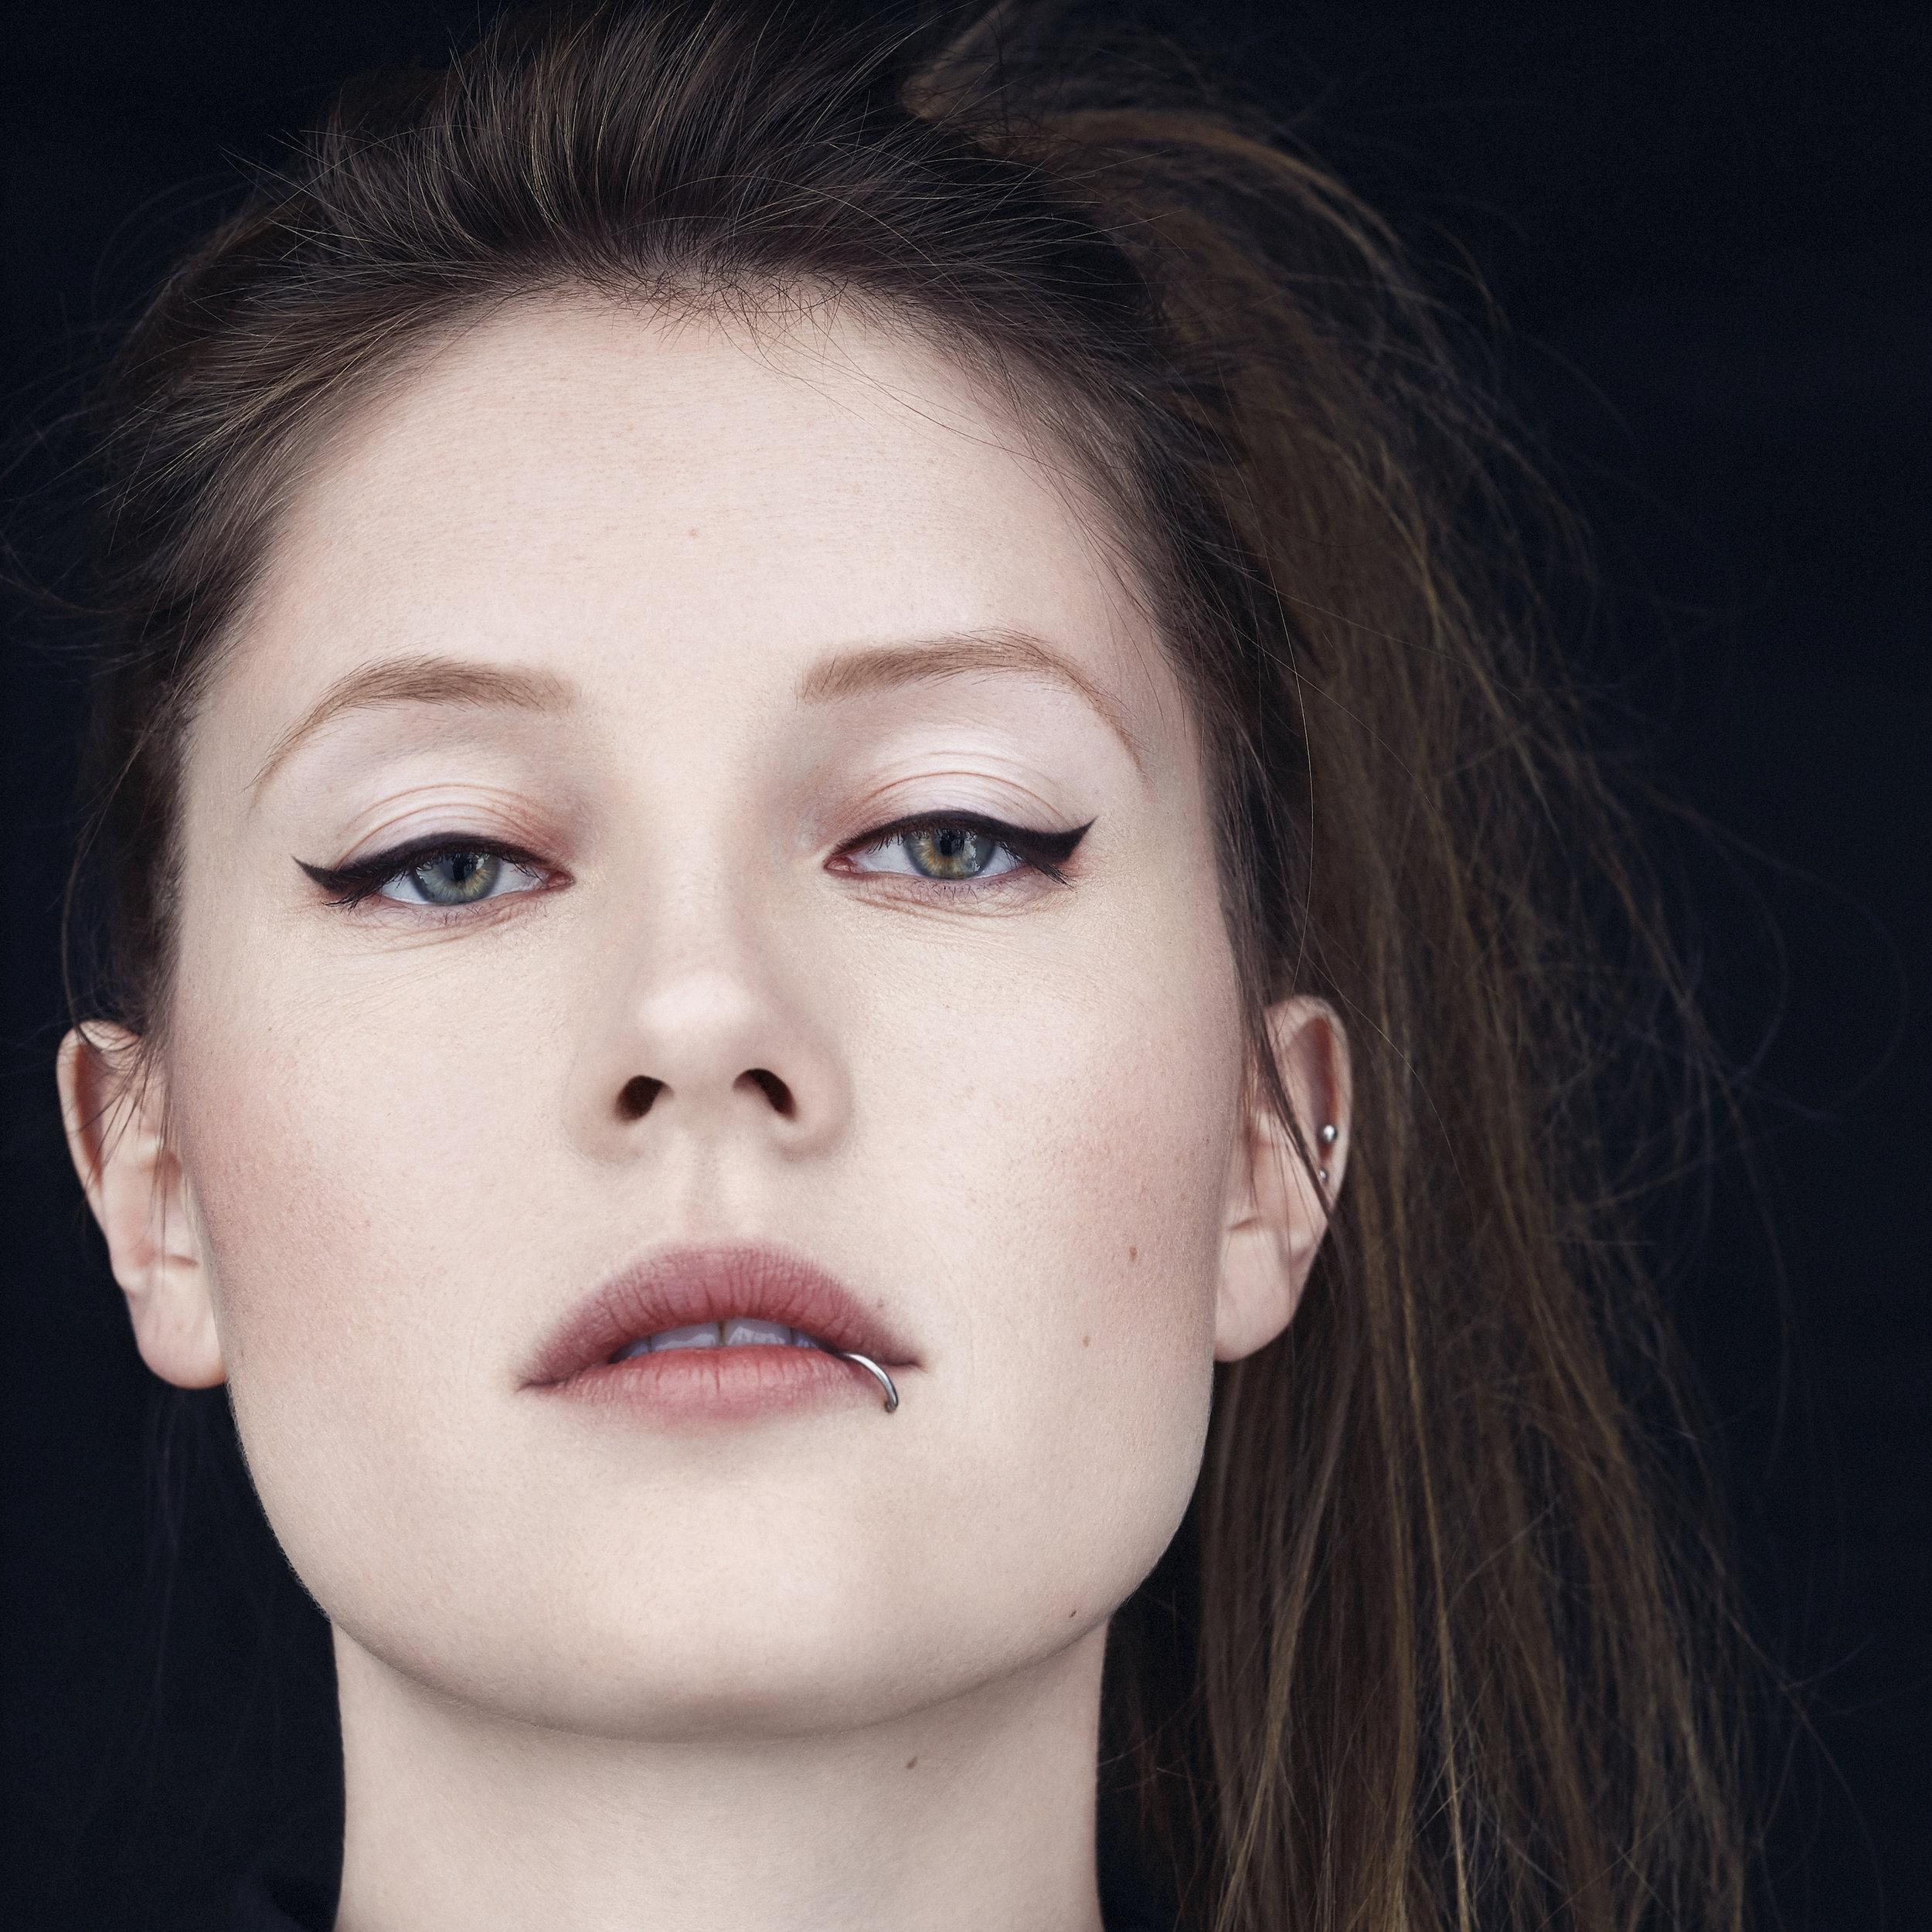 Charlotte de Witte - Read More